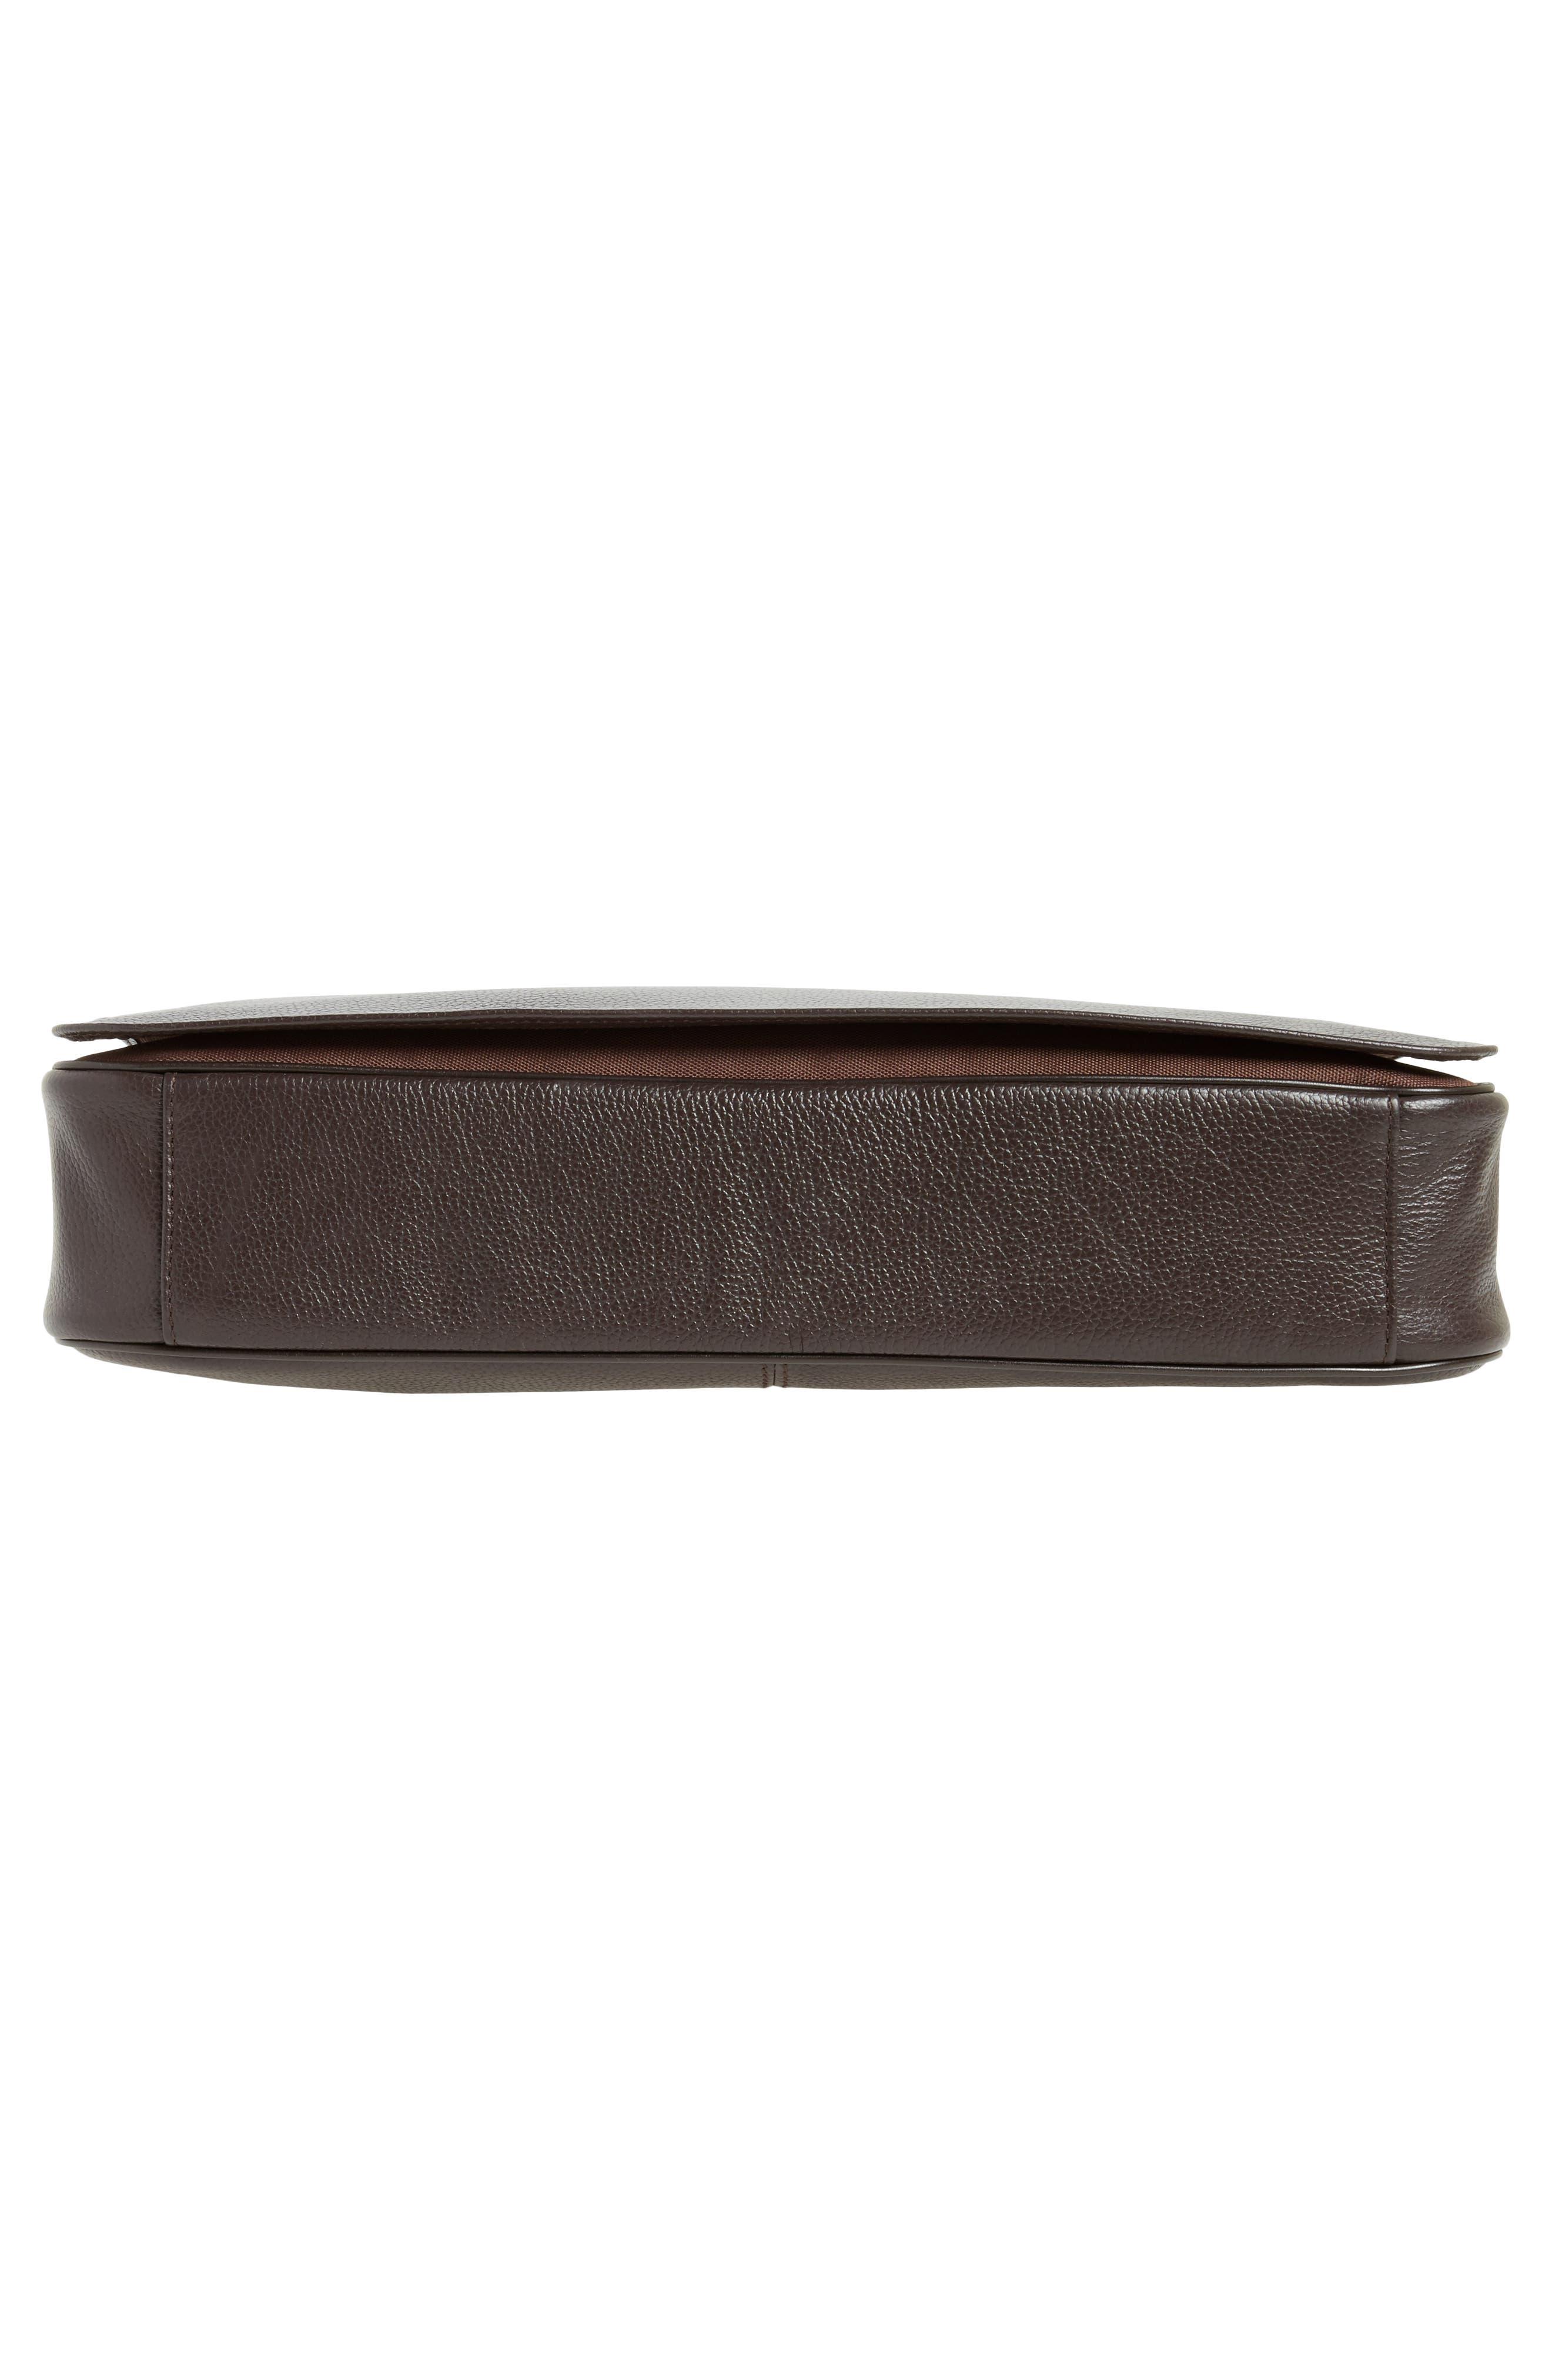 Midland Leather Messenger Bag,                             Alternate thumbnail 6, color,                             Brown